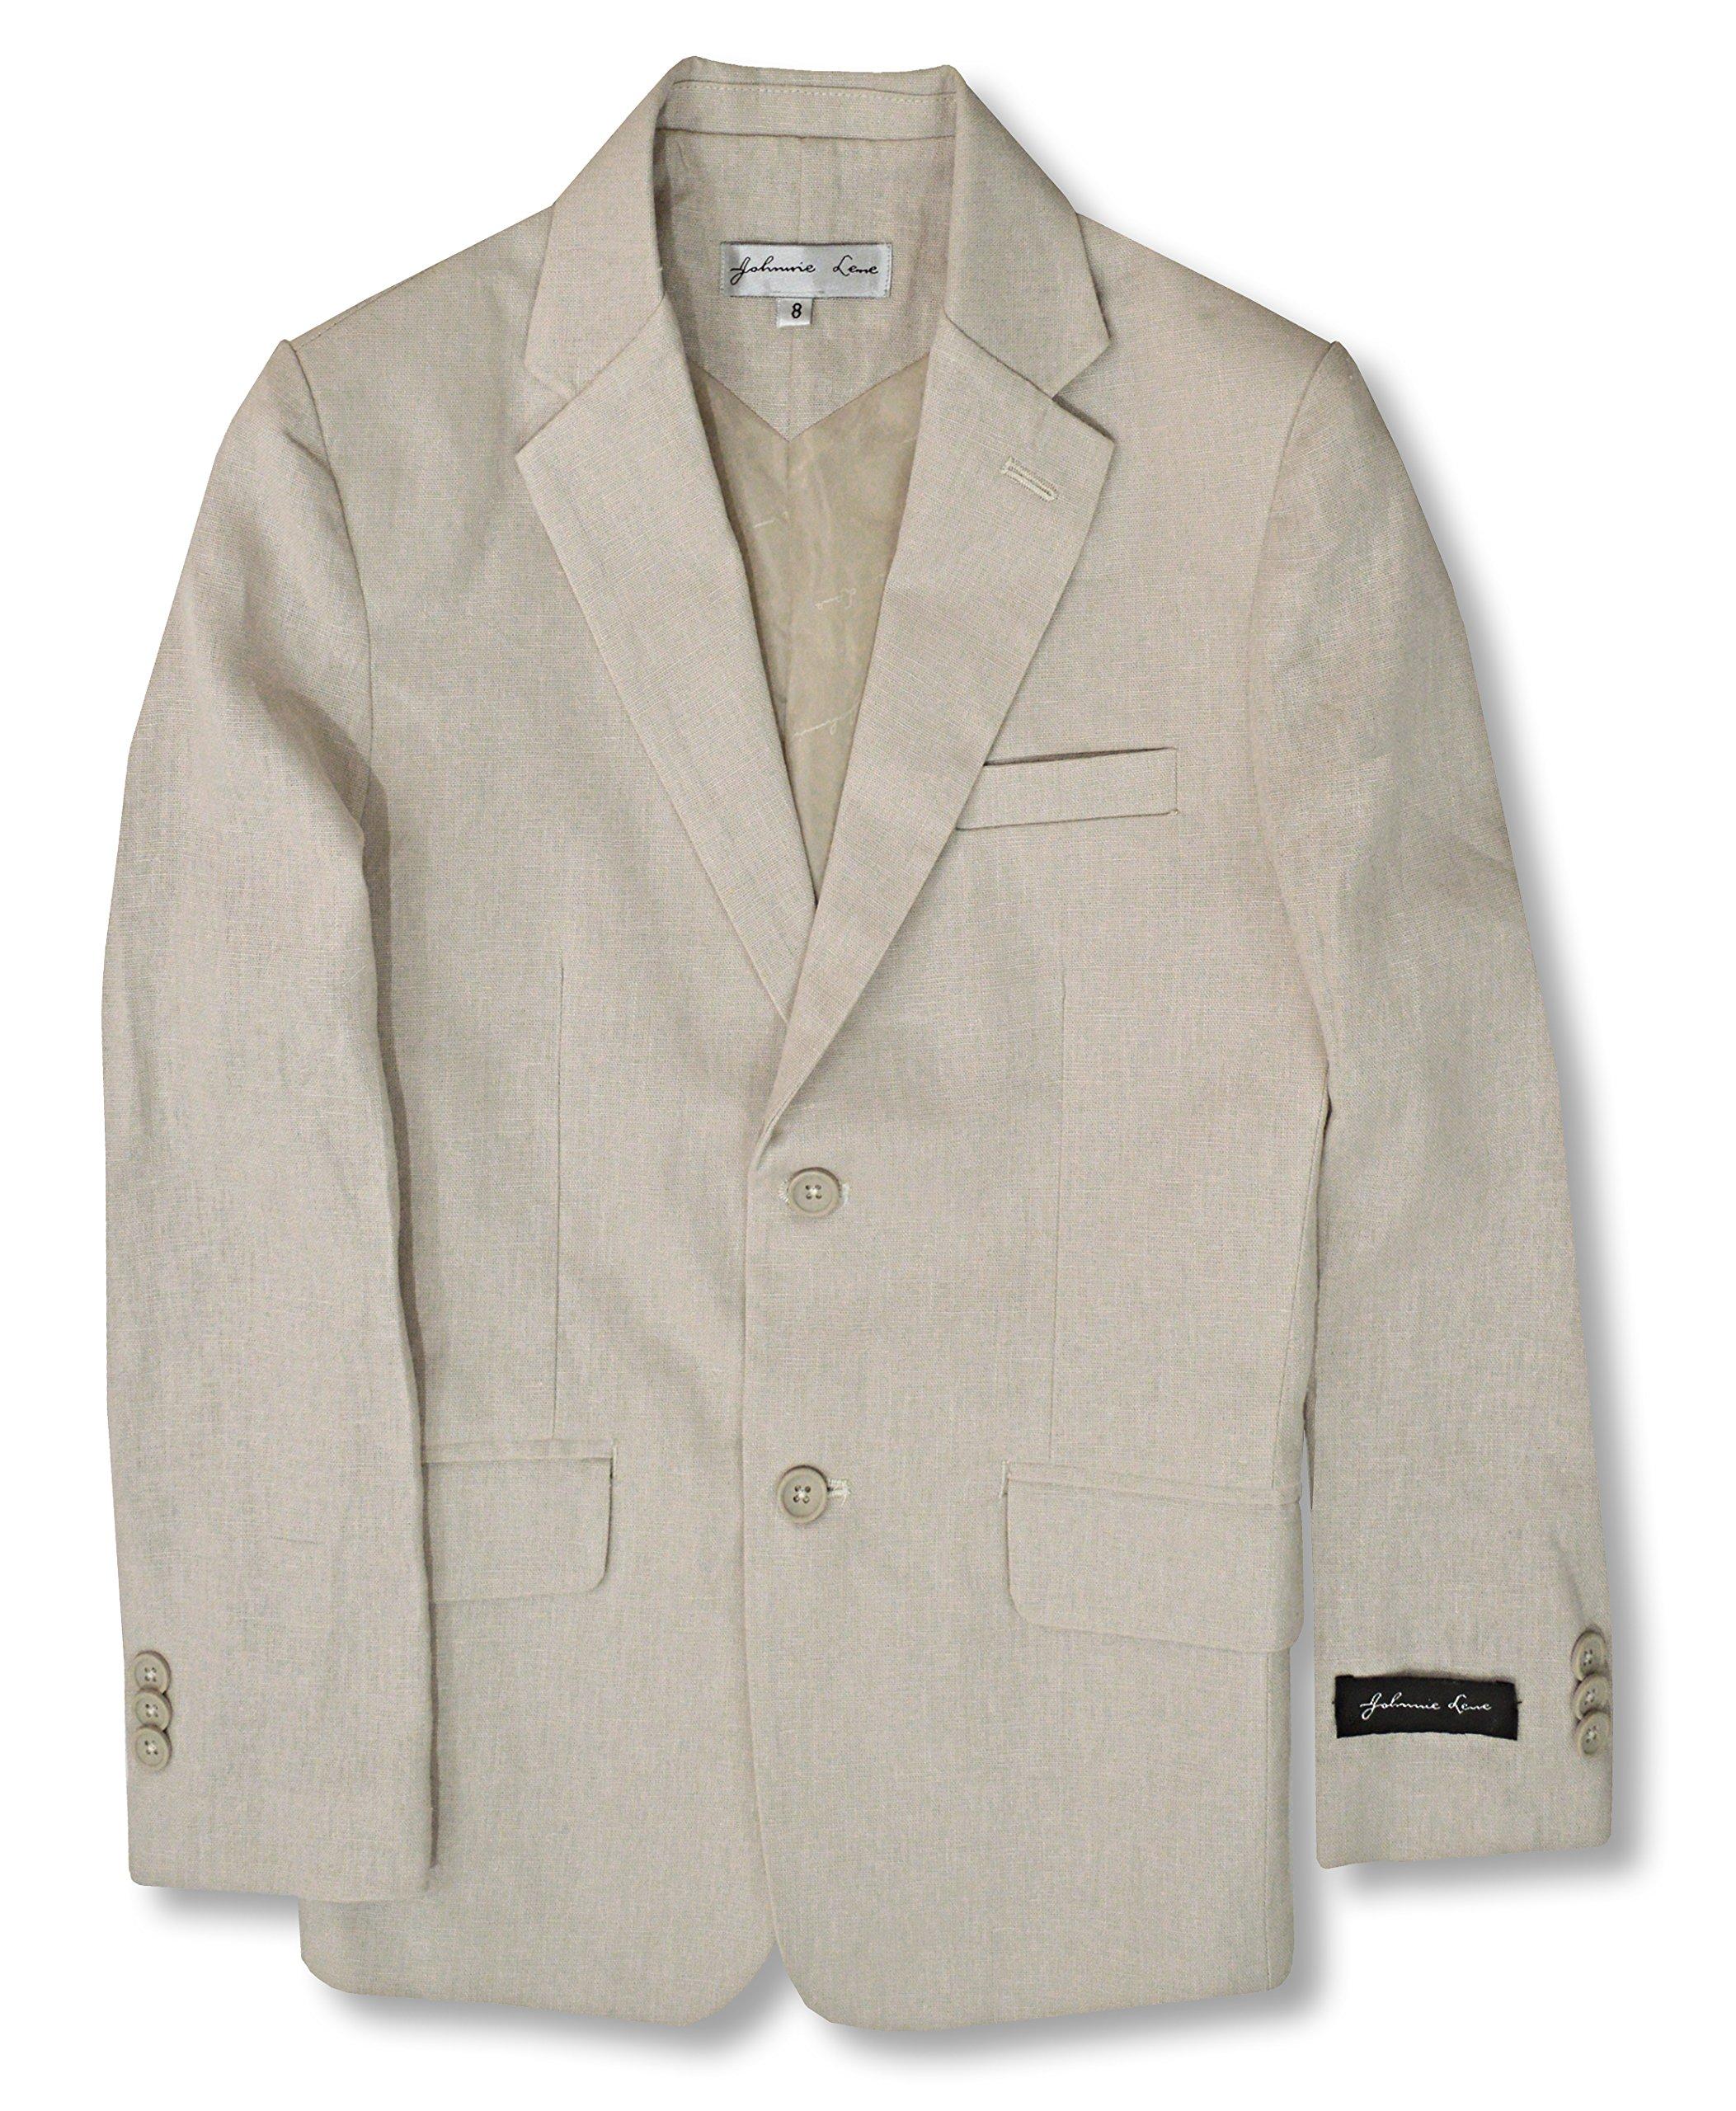 Boys' Cotton/Linen Blend Blazer Jacket #JL38 (7, Natural)